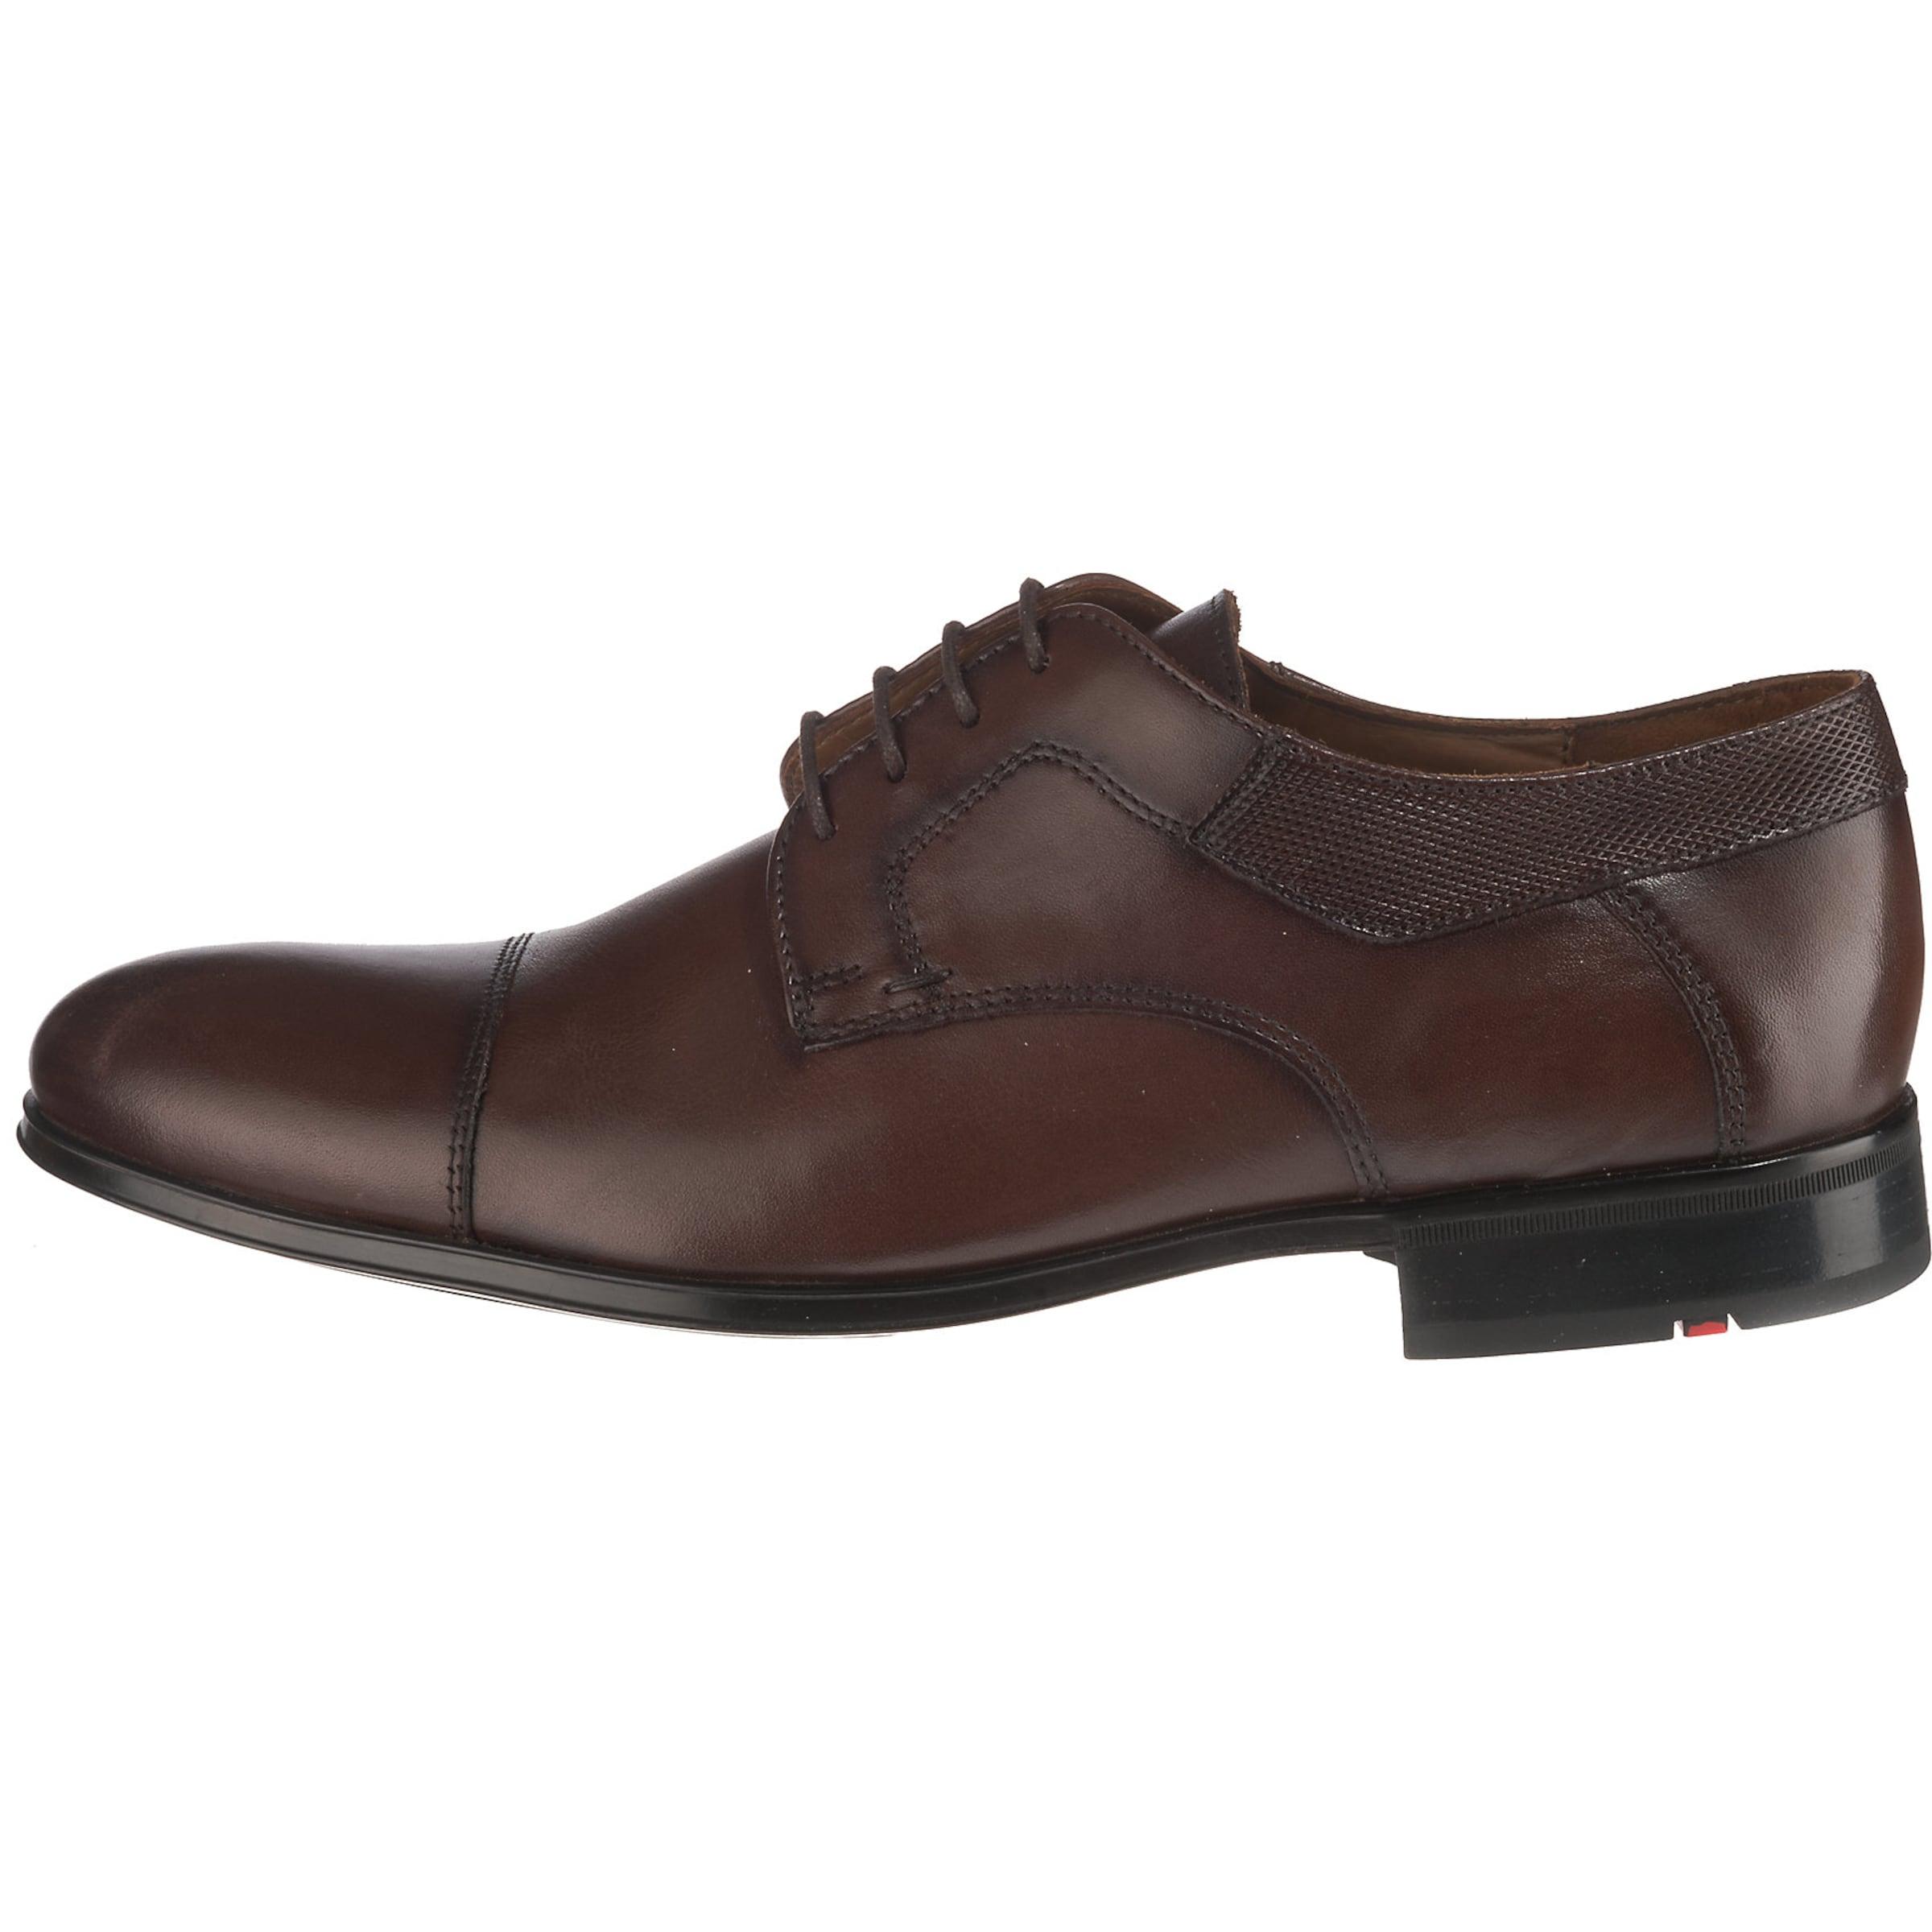 'lalfa' Chaussure À En Lloyd Lacets Marron xhrCBotsQd